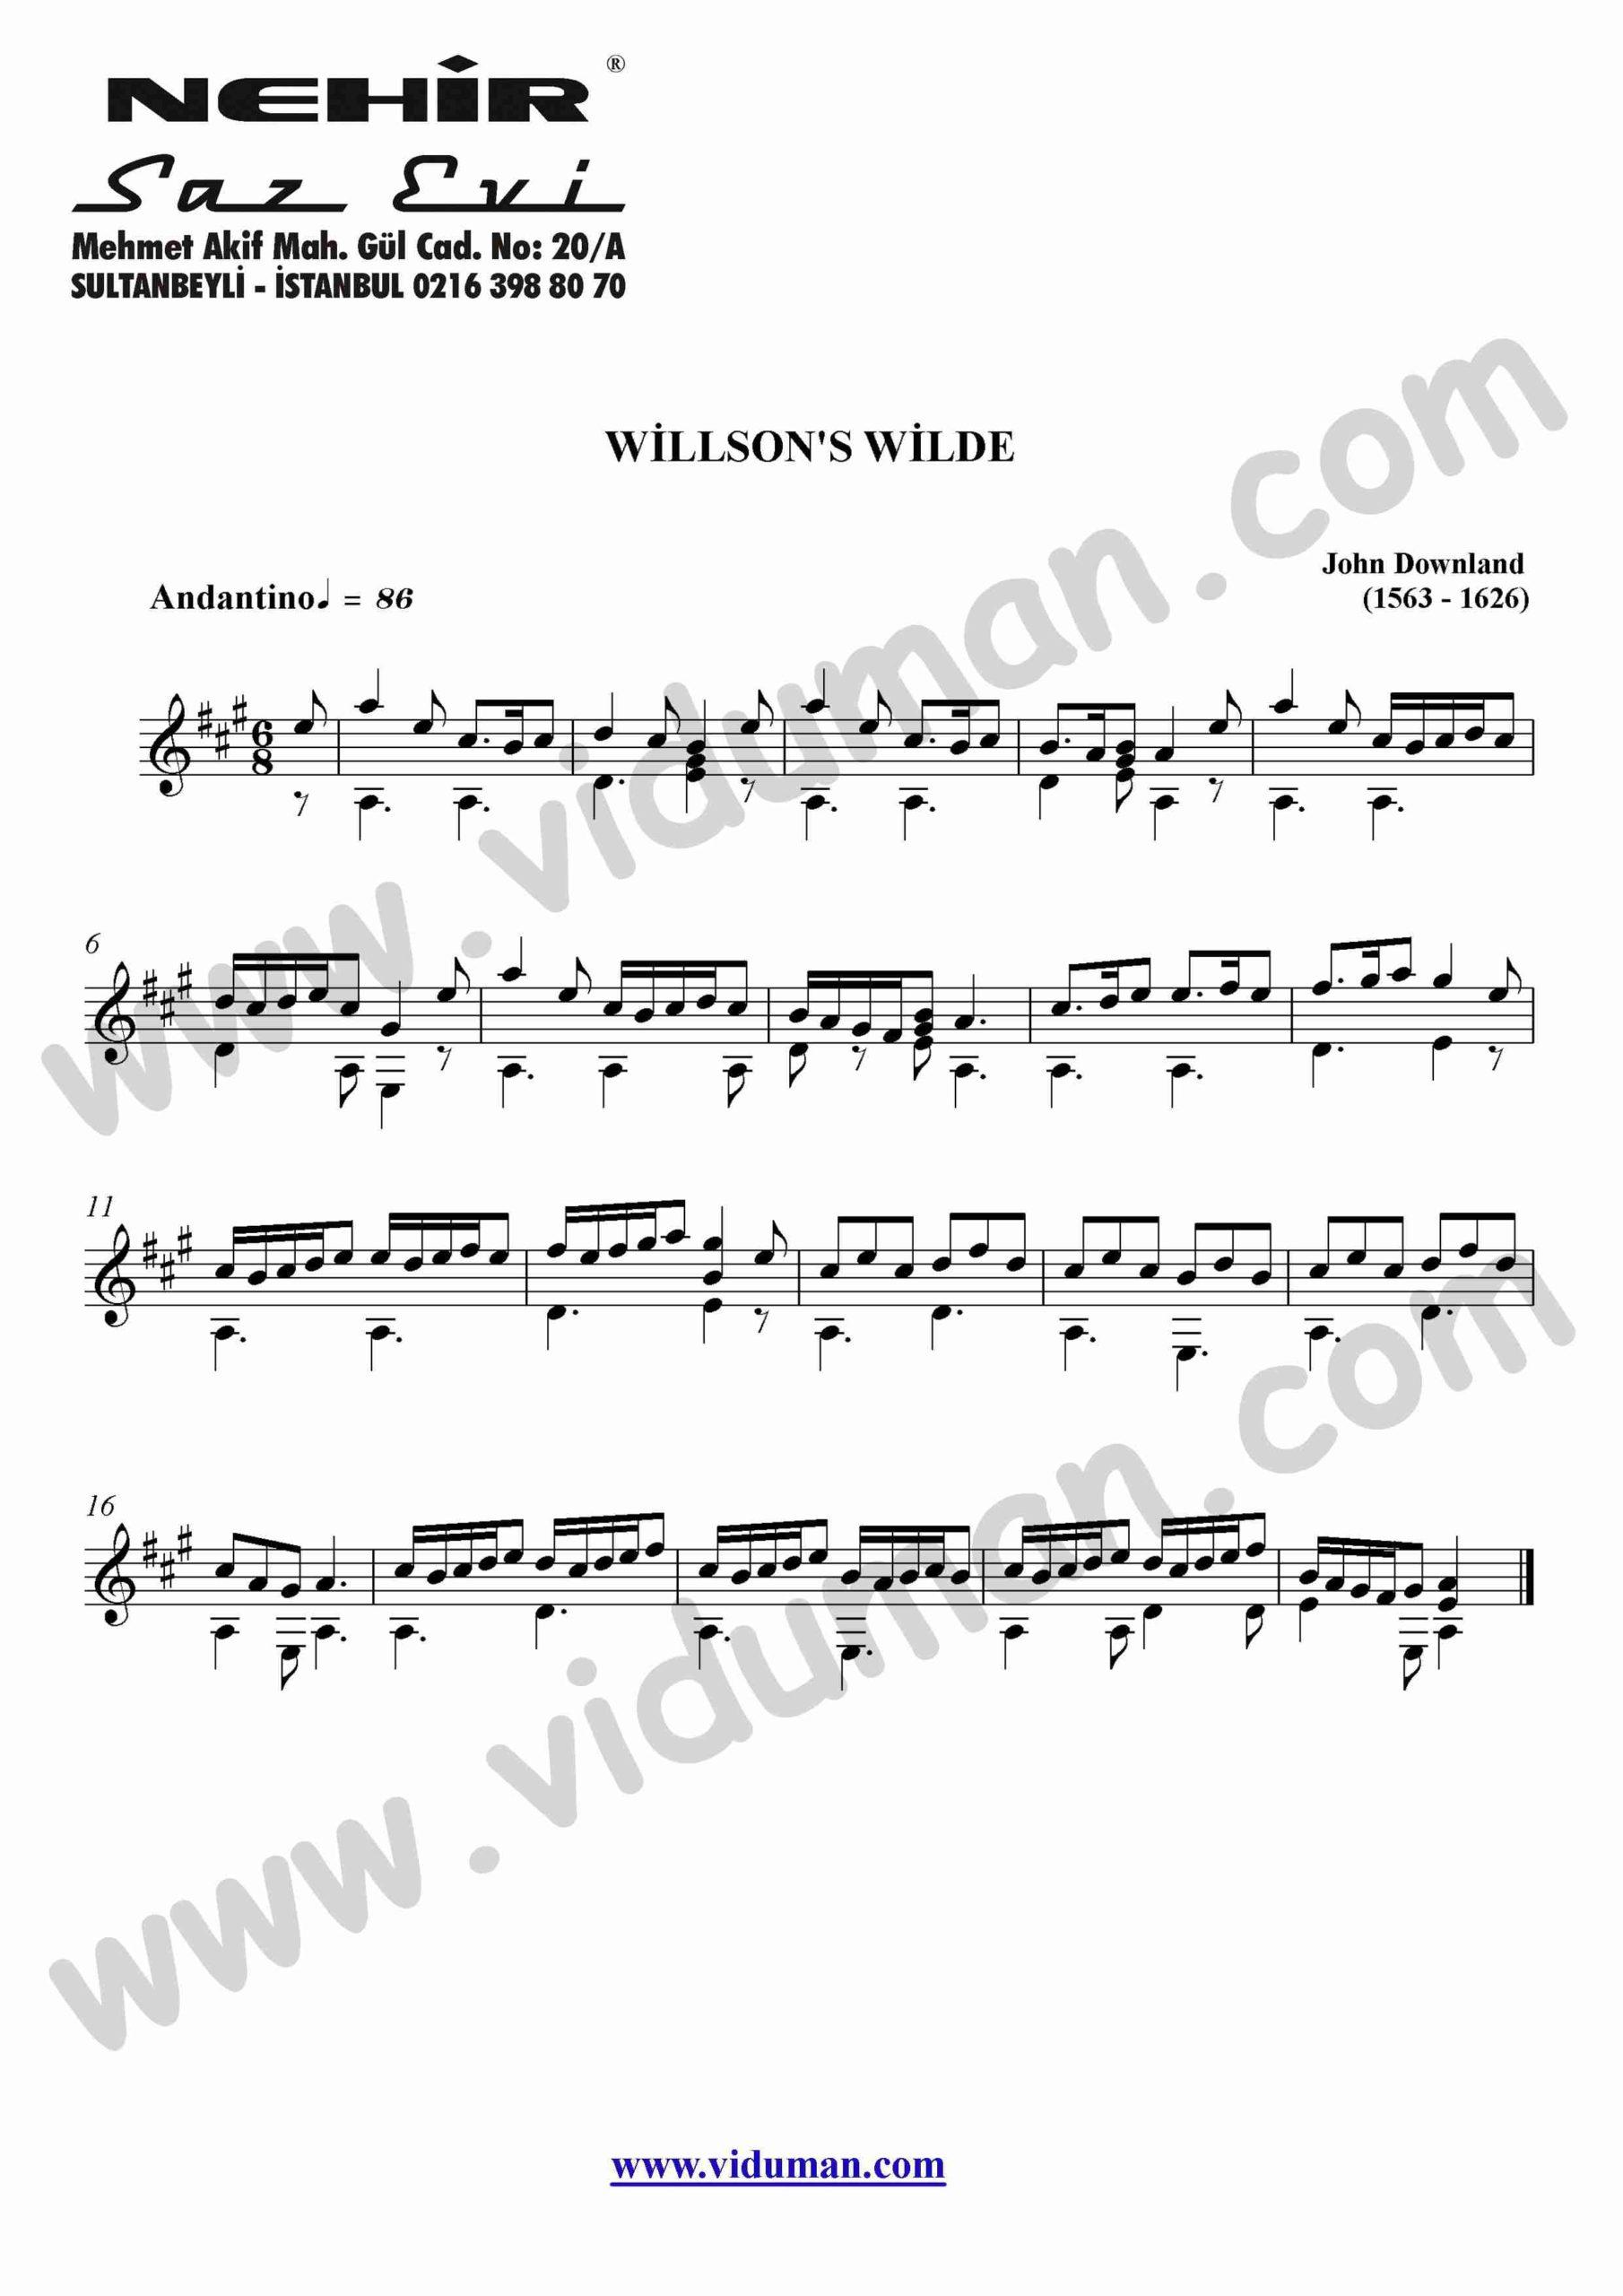 36- Willson's Wilde (John Downland)